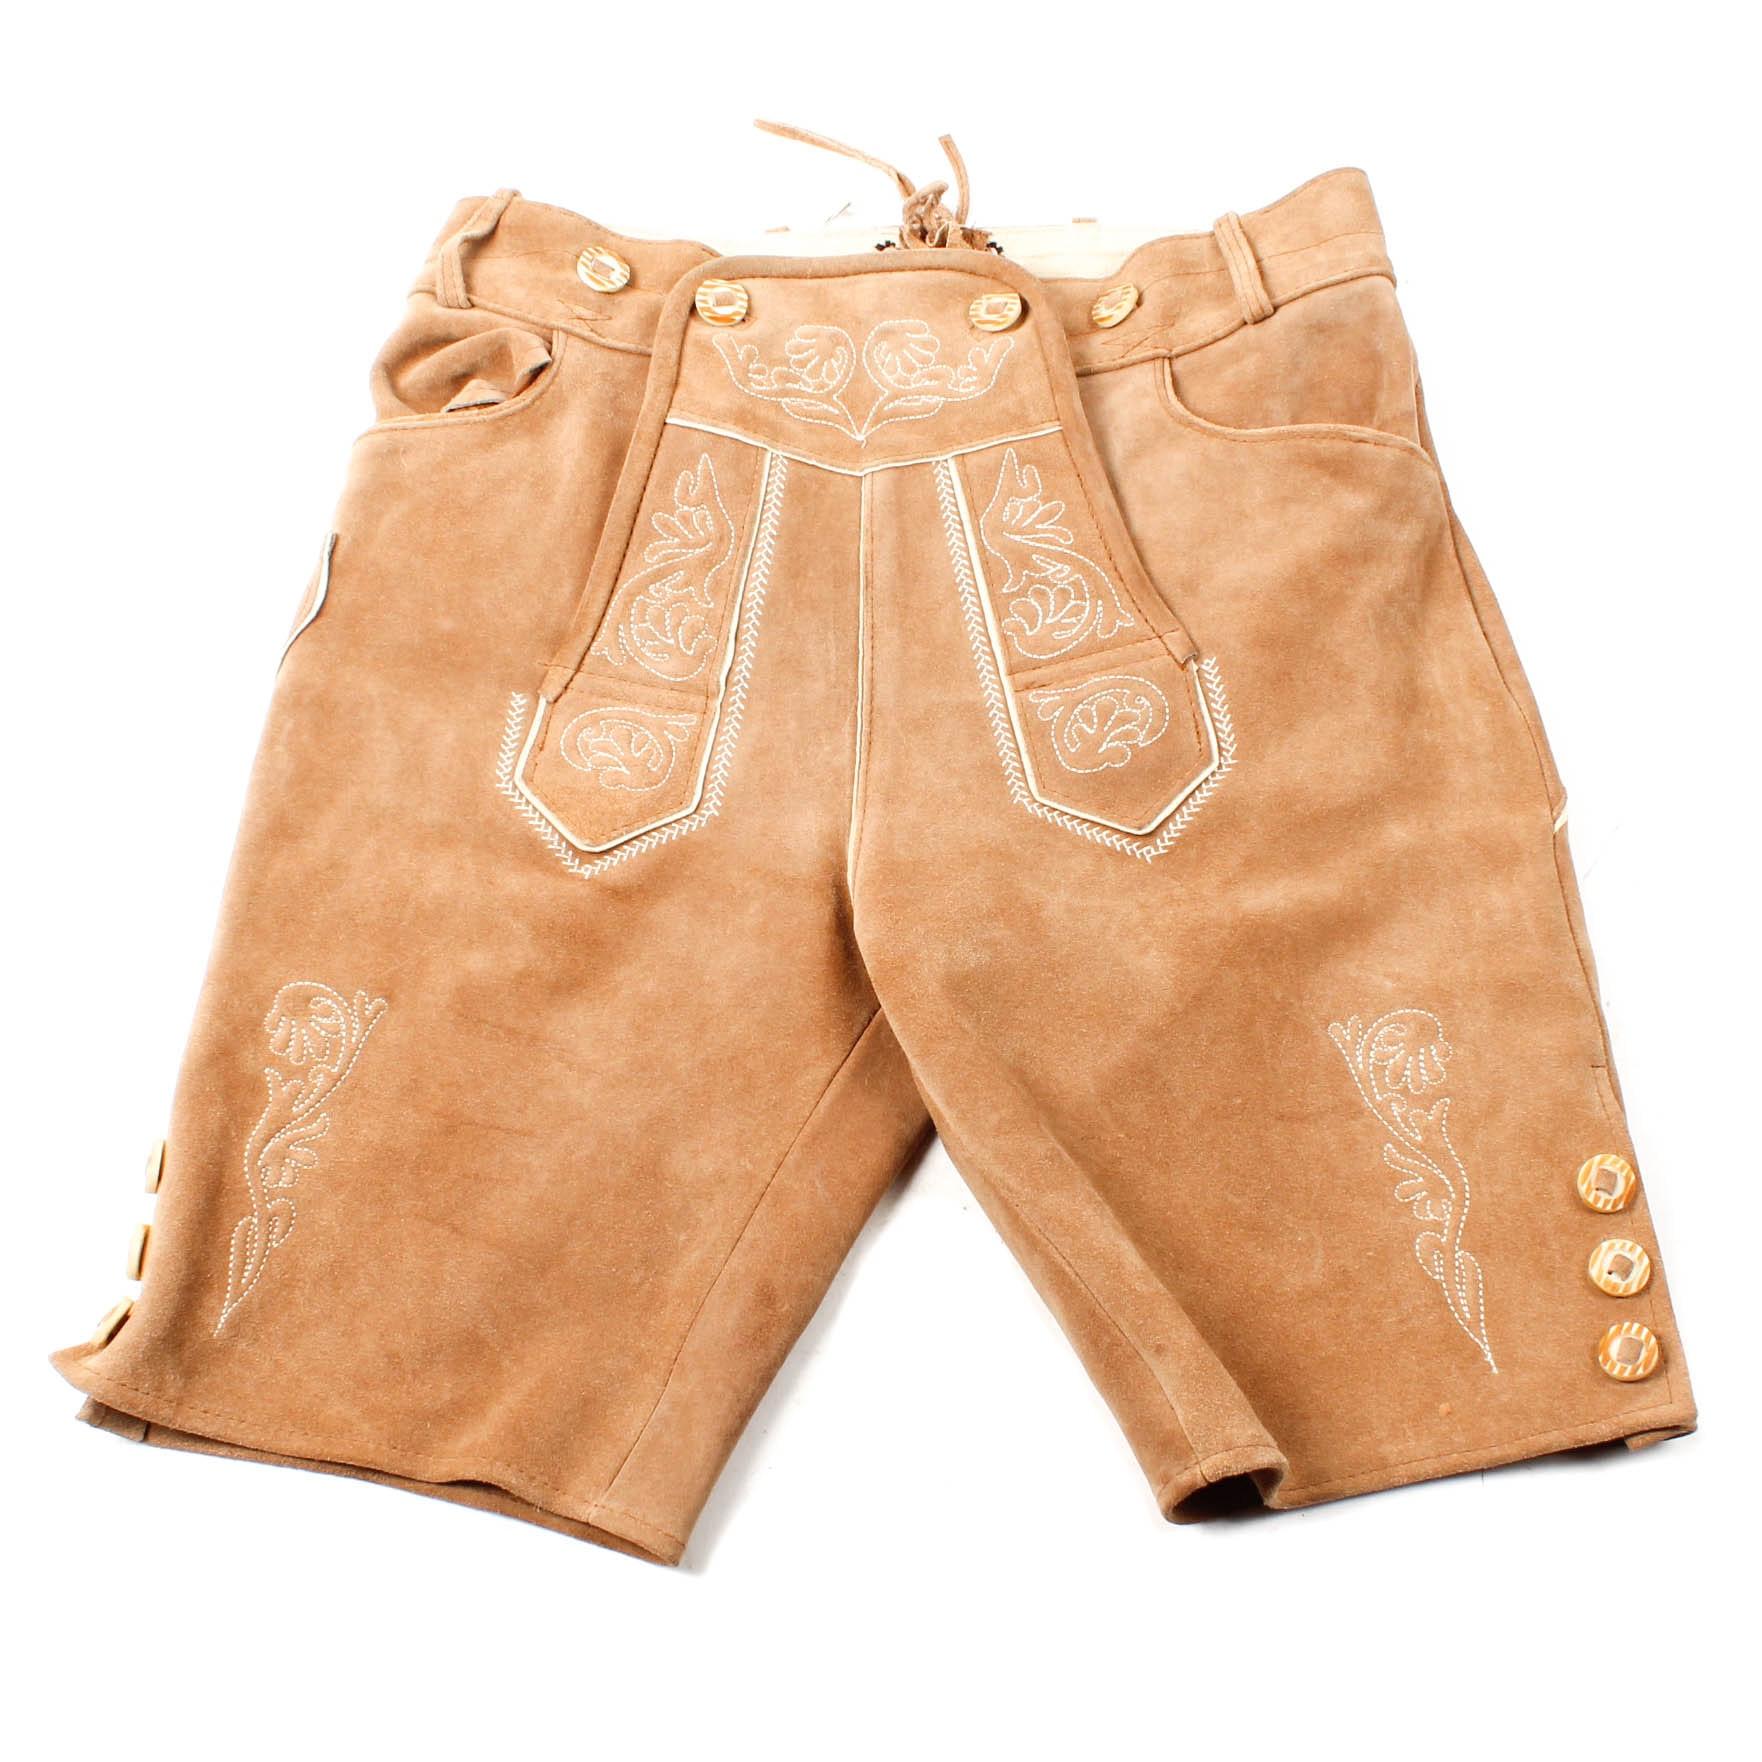 Vintage Alpine Tan Suede Lederhosen with Stitched Detailing